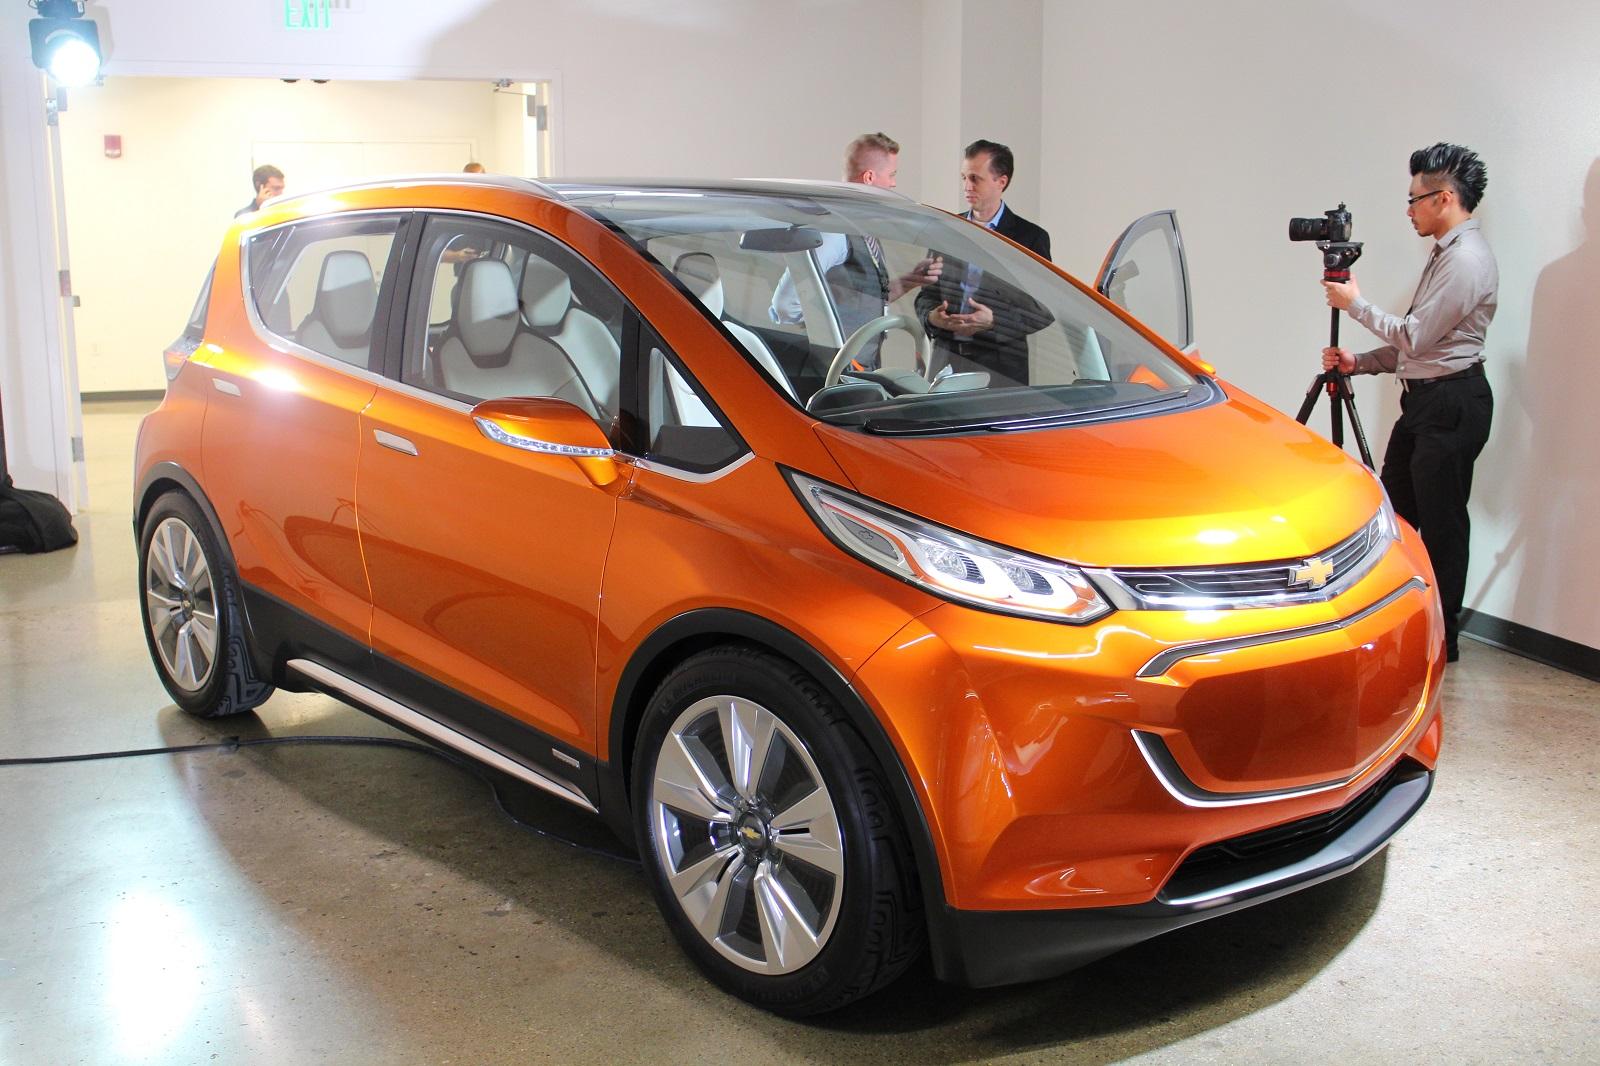 2017 Chevy Bolt EV Development GM LG Chem Reveal Deep